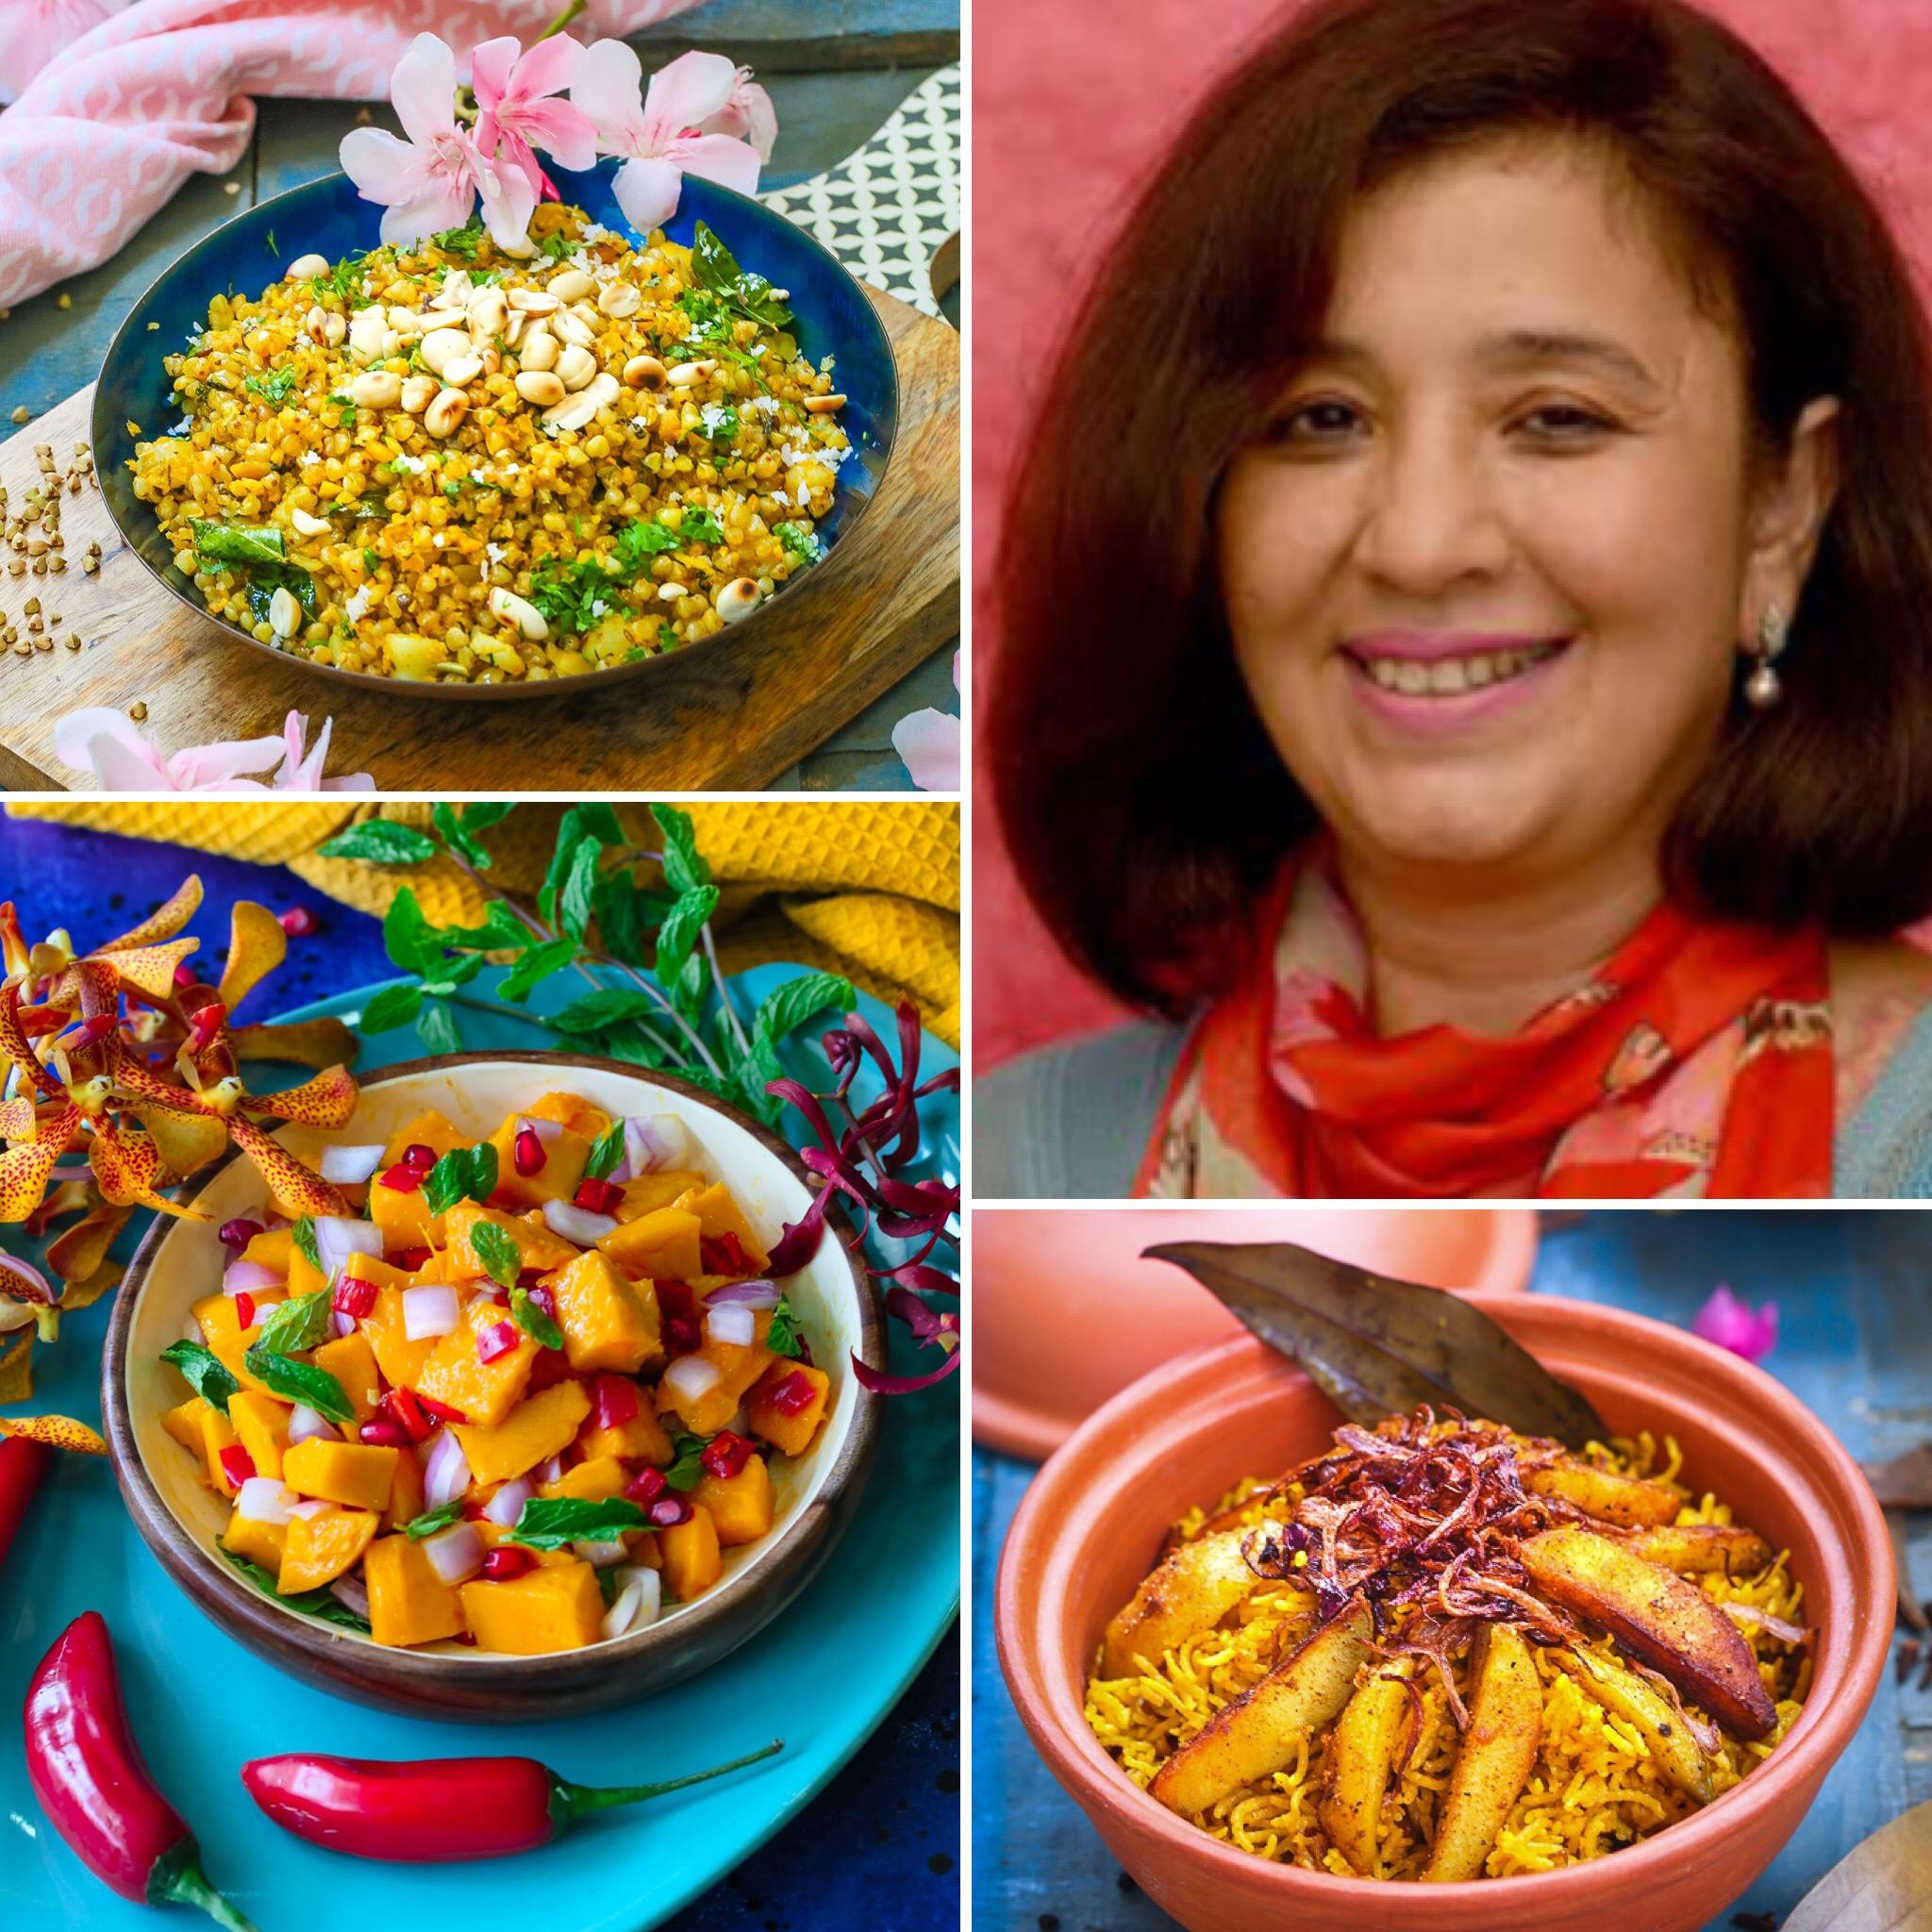 Anuja, Buckwheet, Mango Salad, Taheri